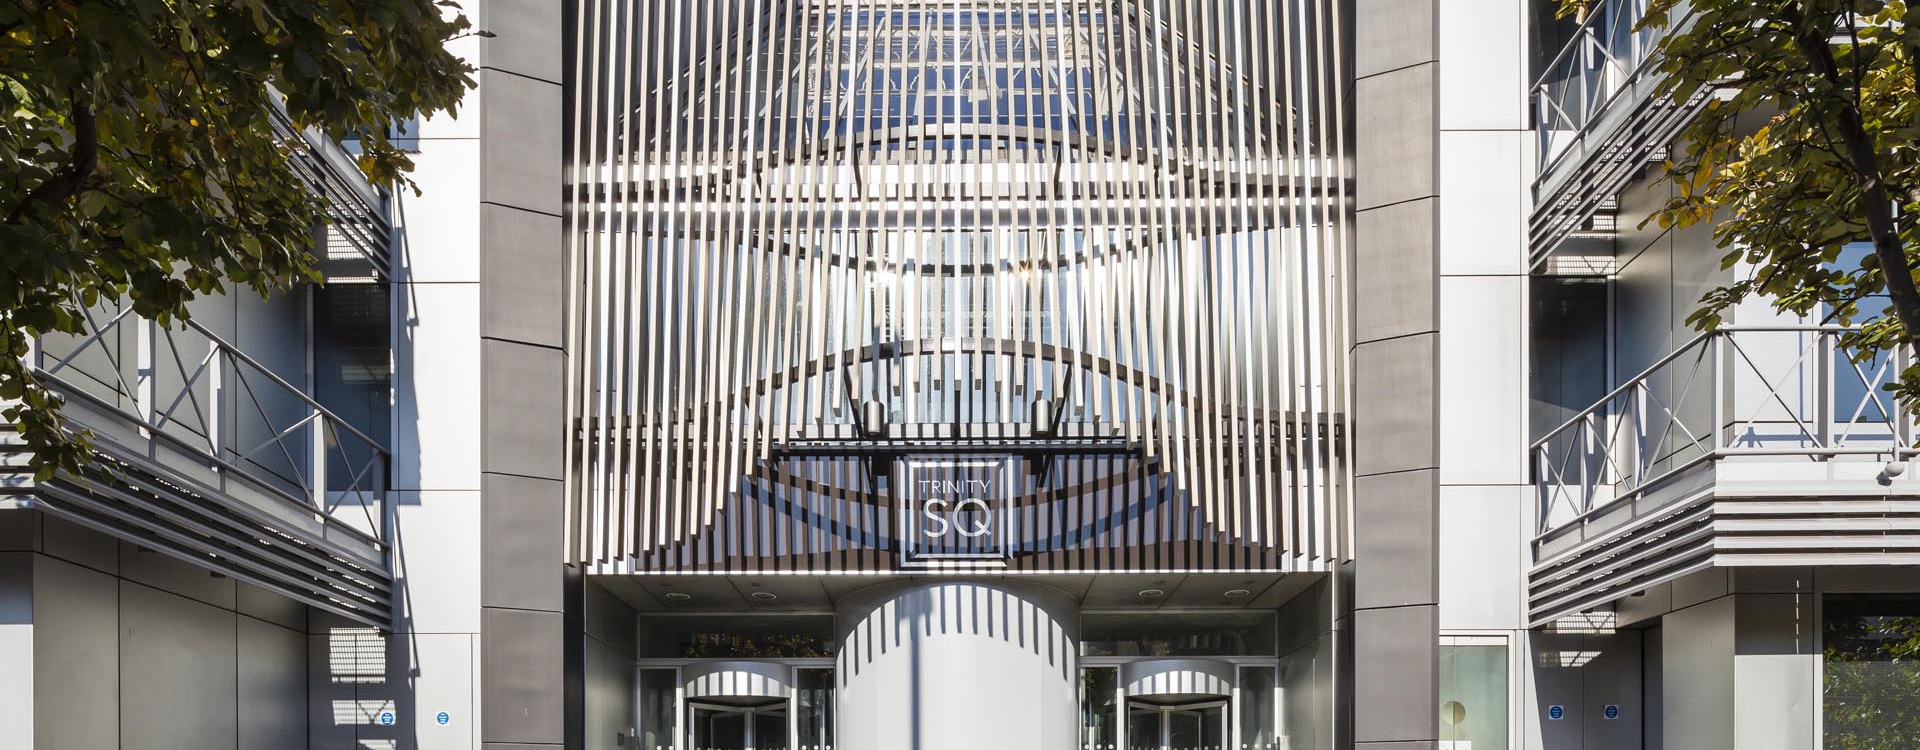 Trinity Square image